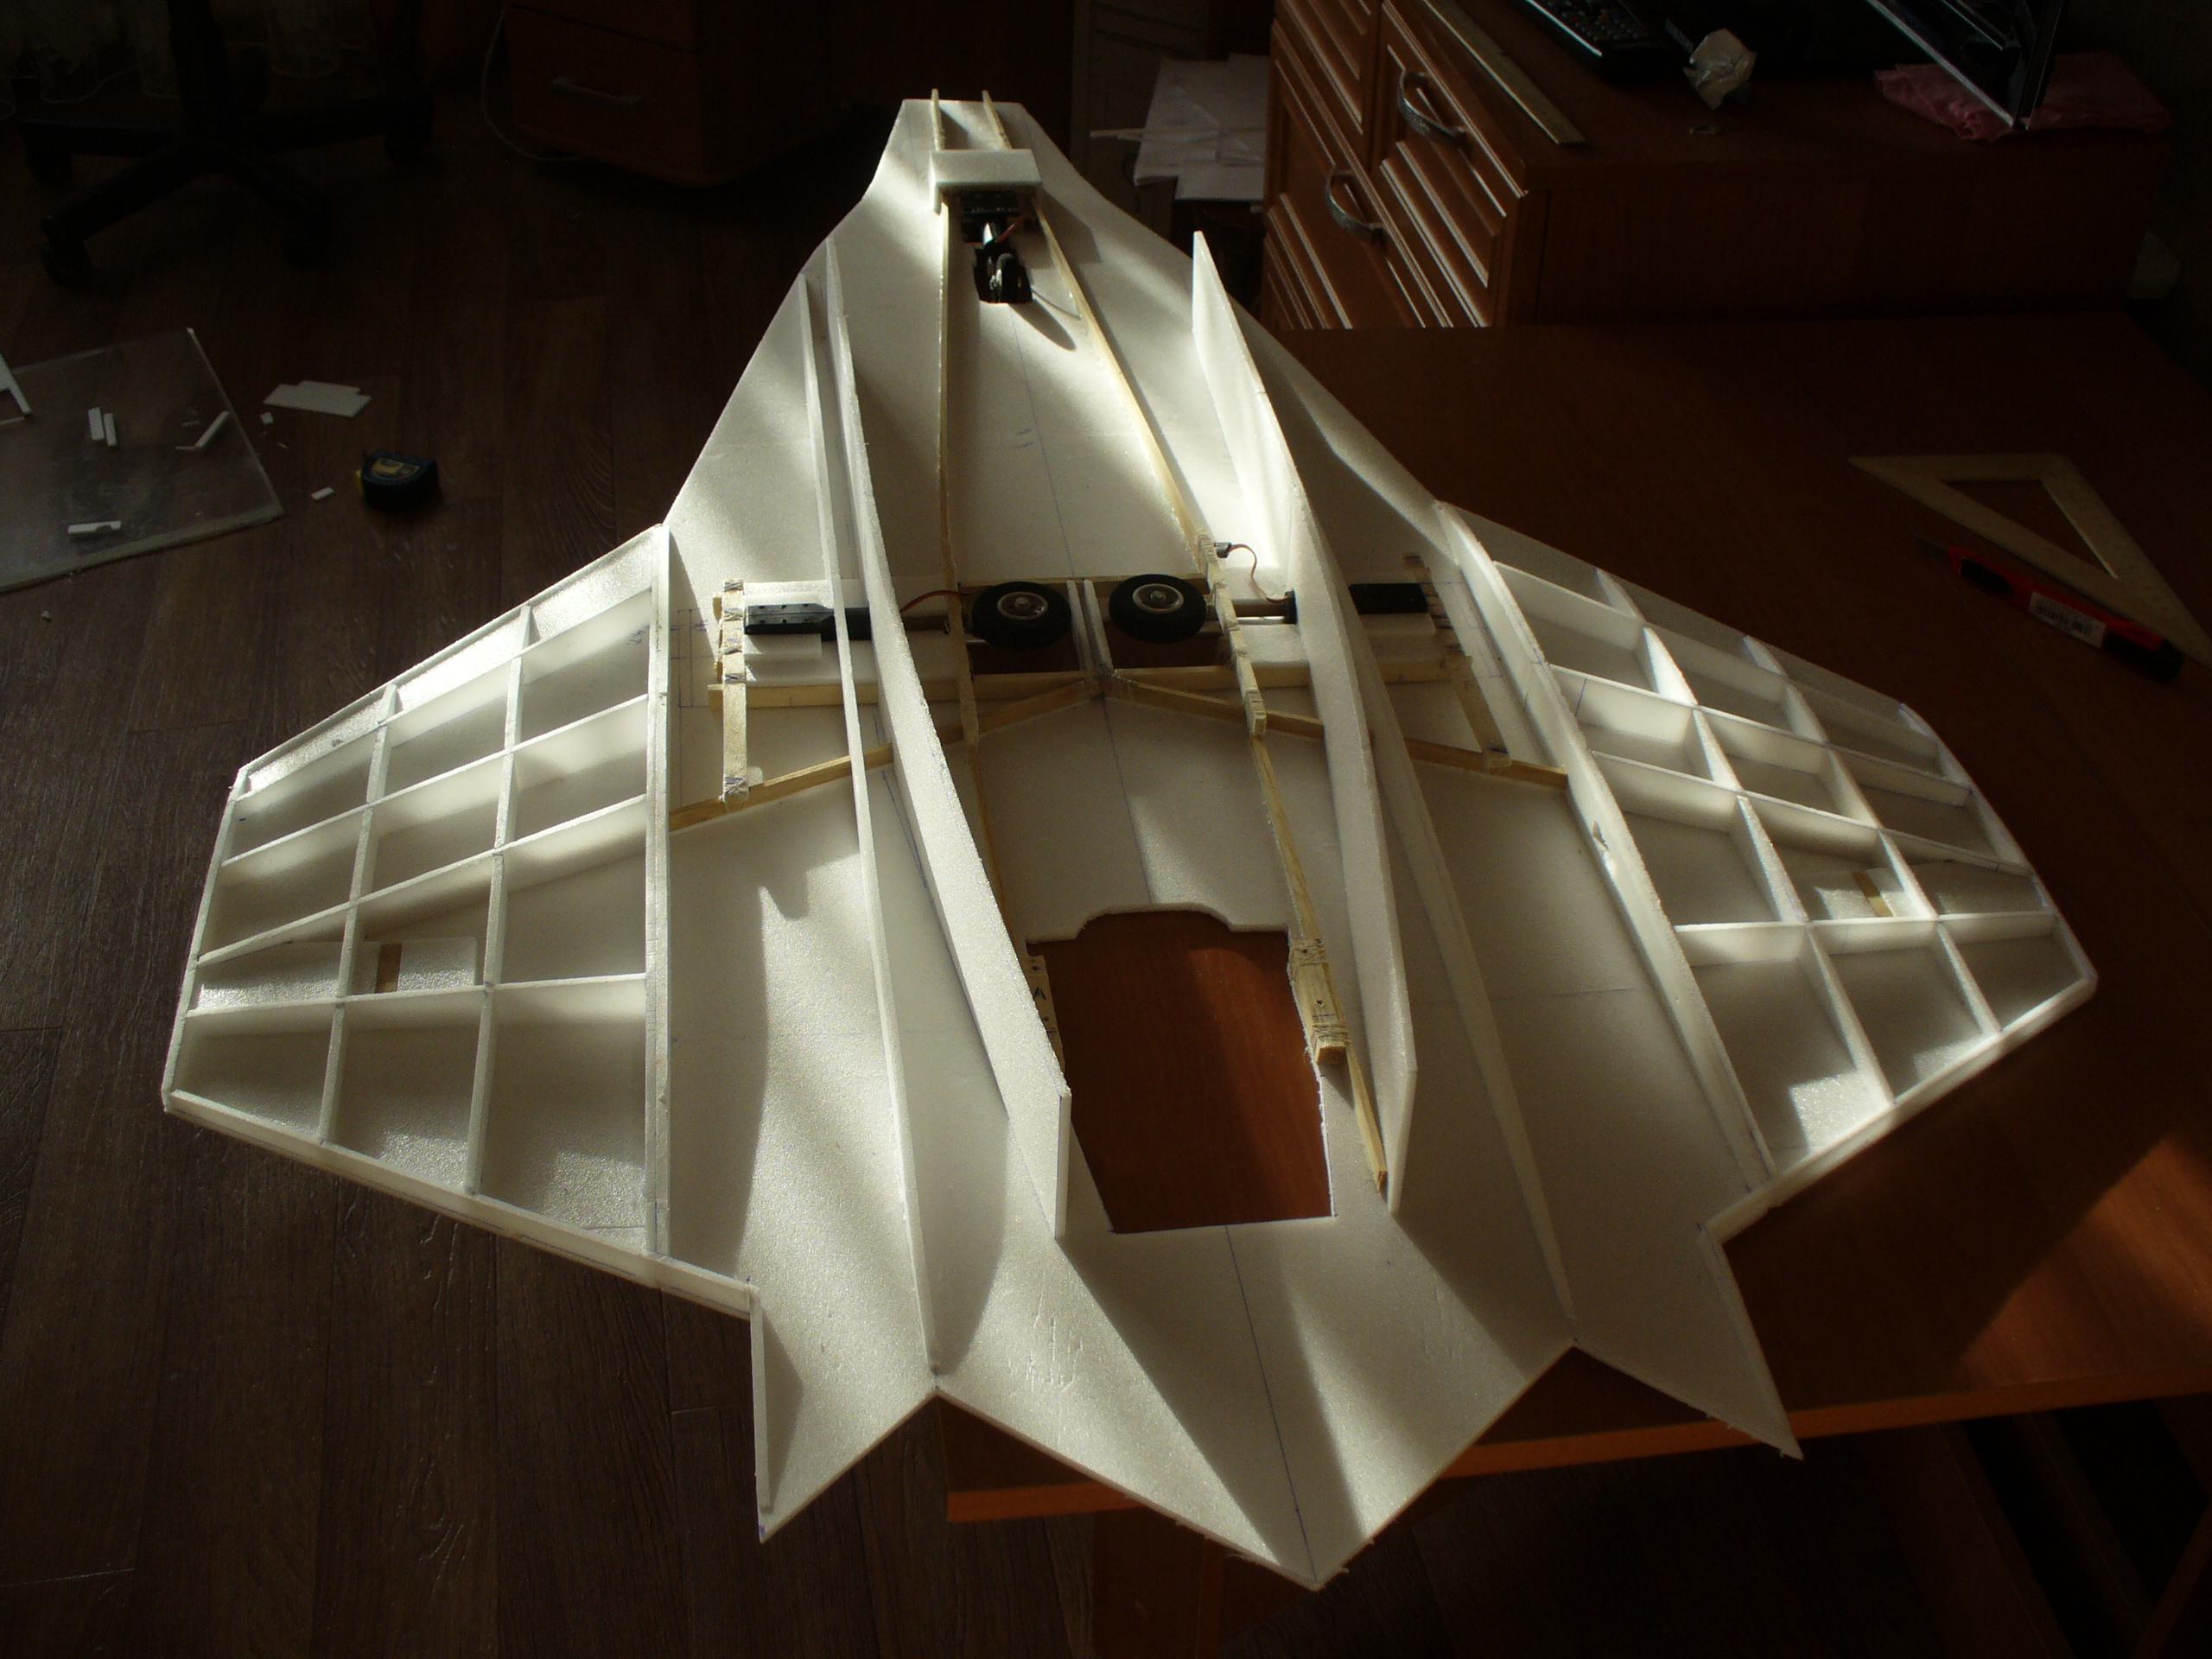 касатка из модулей оригами схема видео